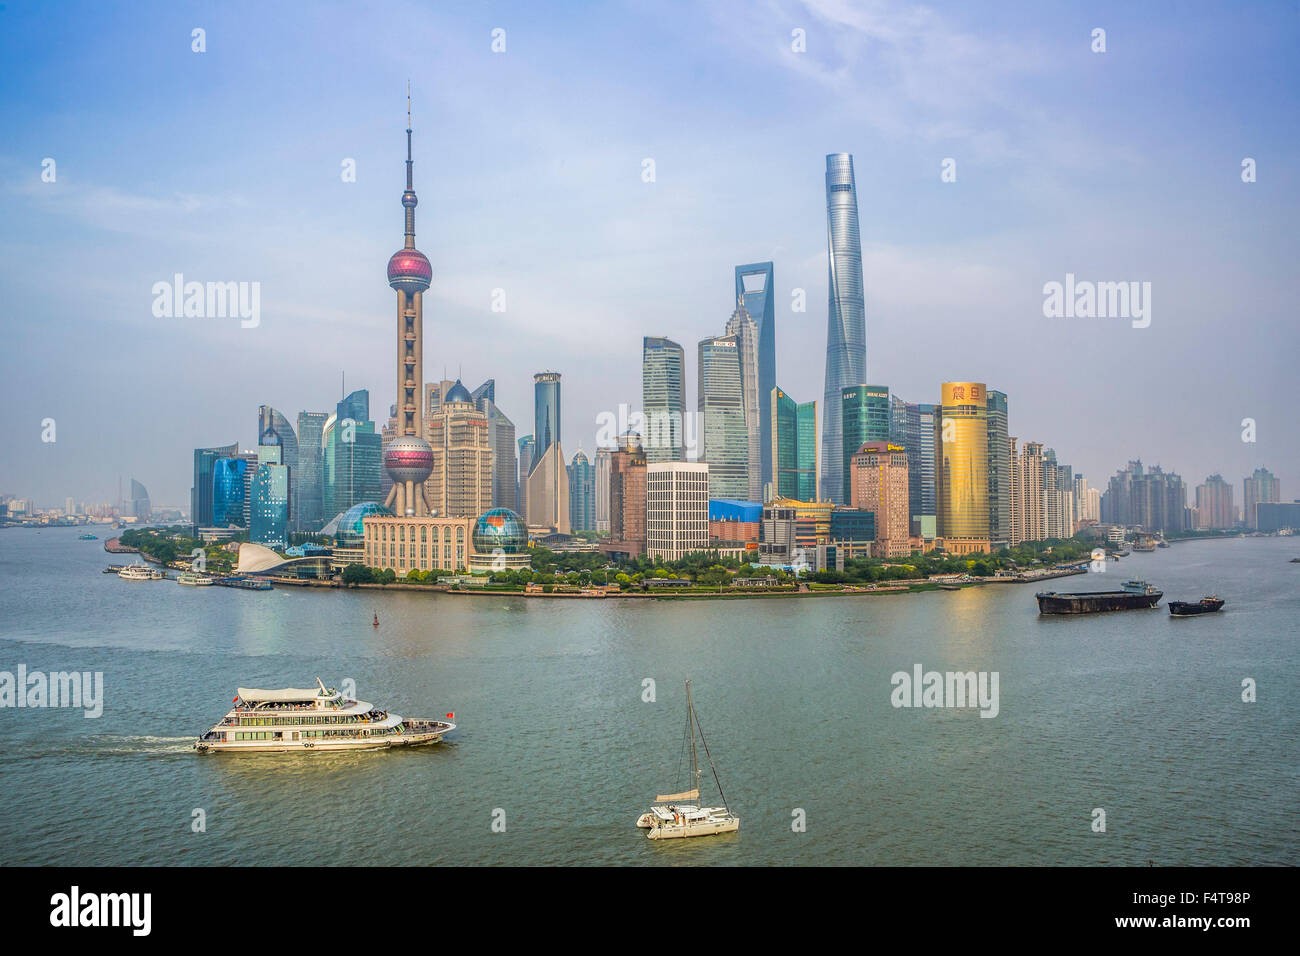 China, Shanghai City, Pudong Skyline - Stock Image